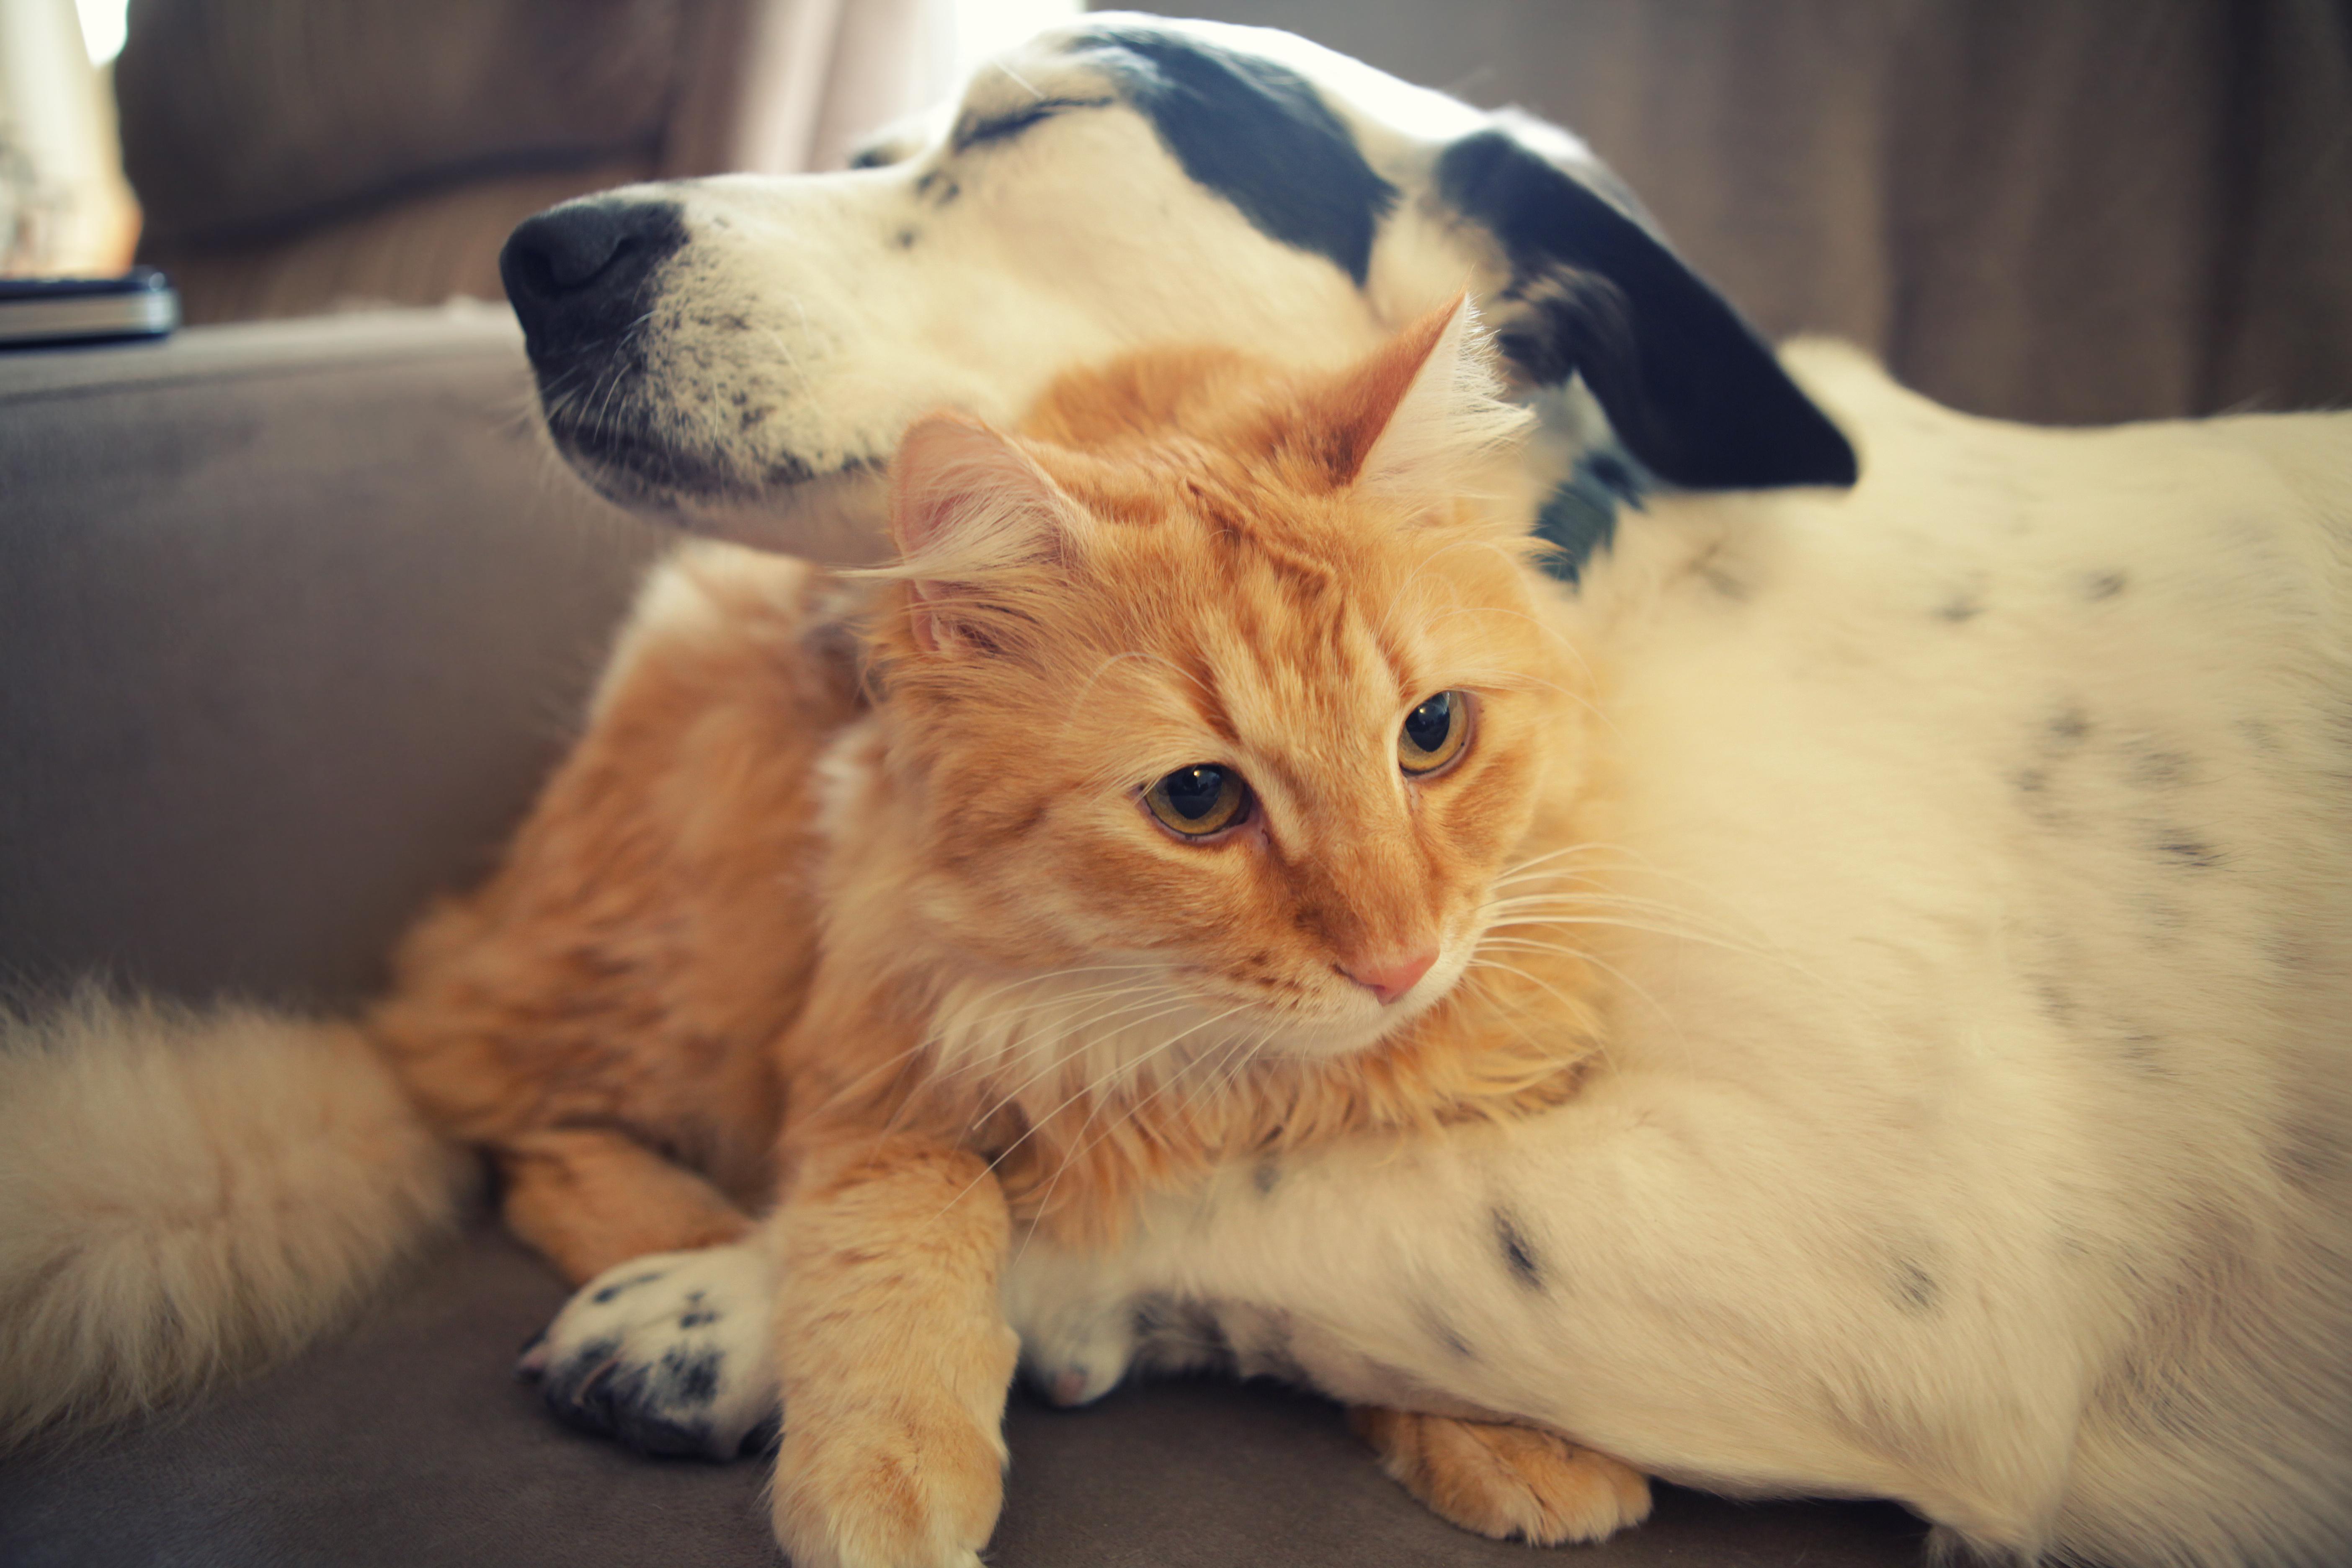 Cute Dog And Cat Wallpaper